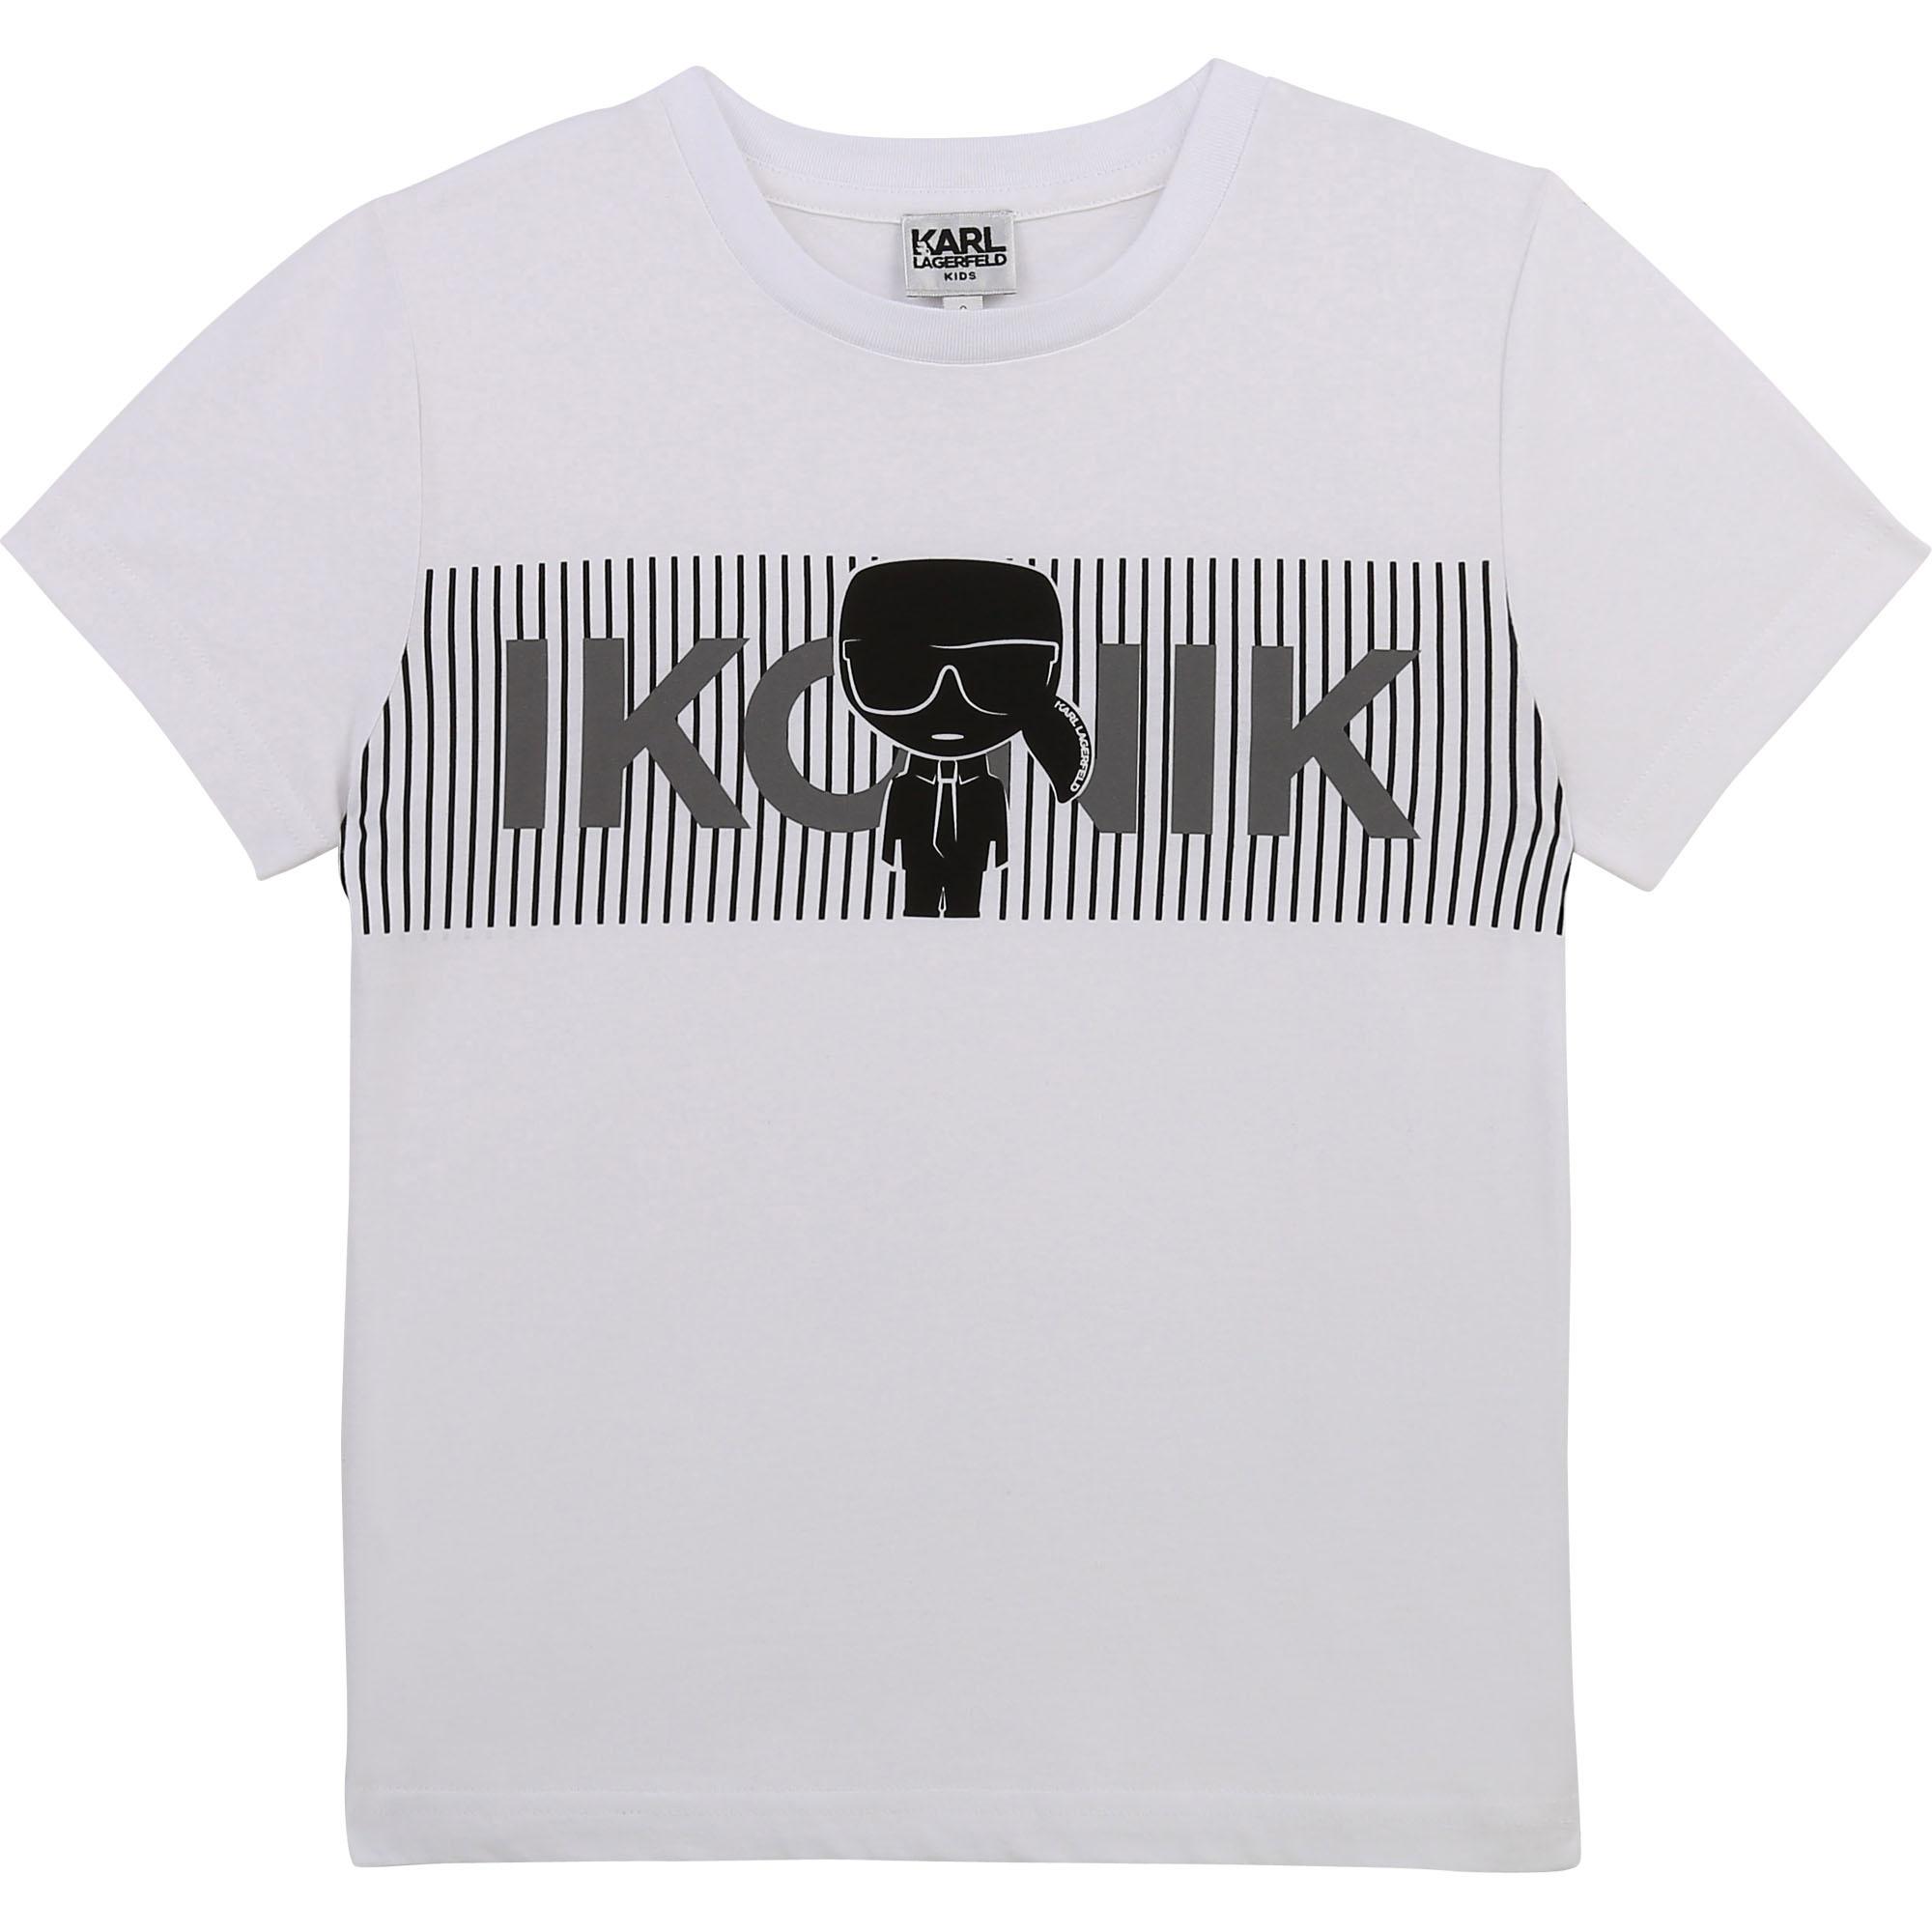 KARL LAGERFELD  KIDS t-shirt imprimé logo-1